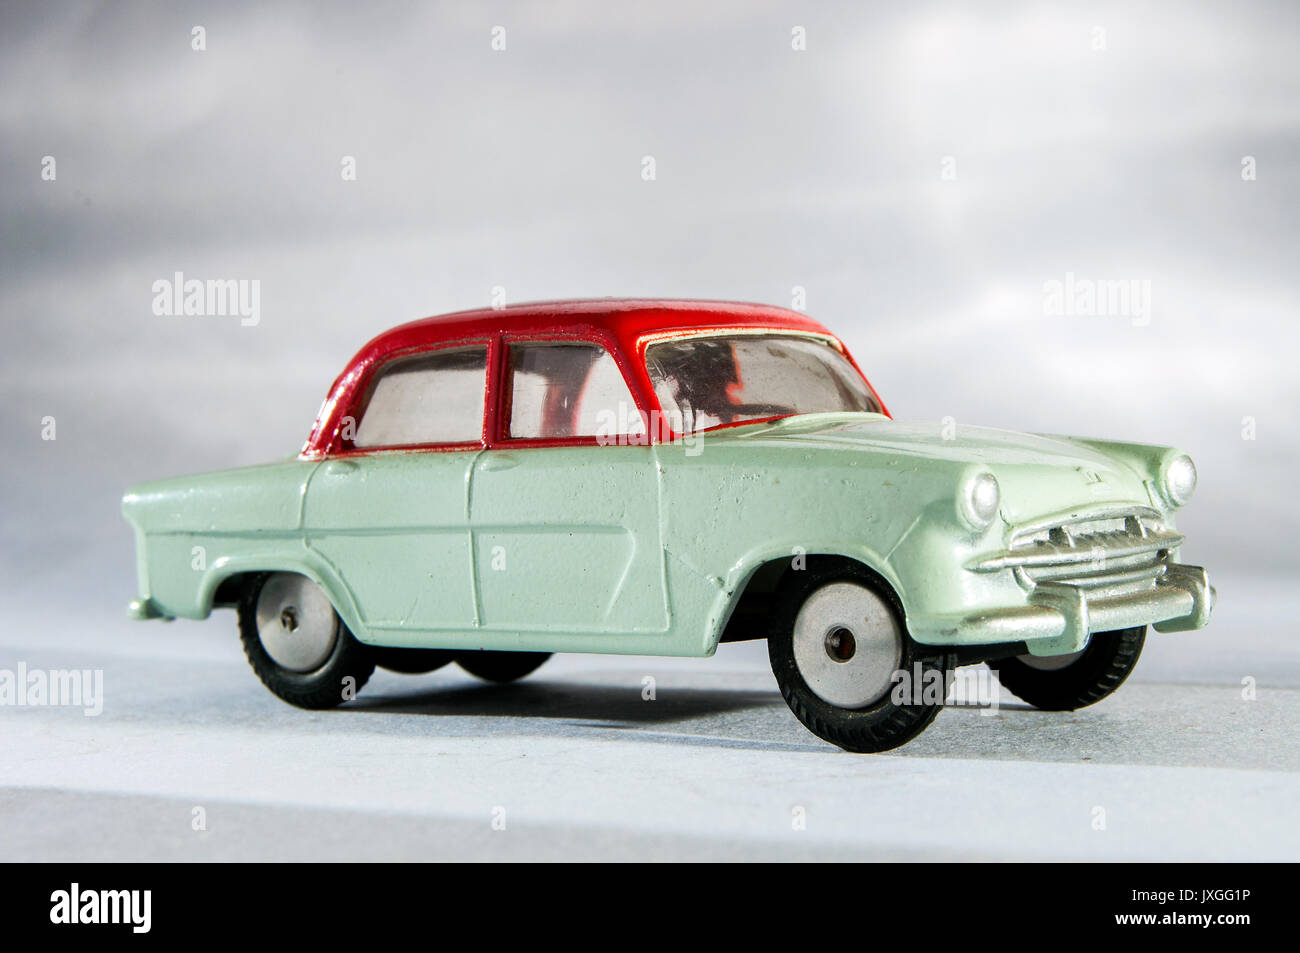 Vintage model Standard Vanguard 111 car in studio setting Stock ...